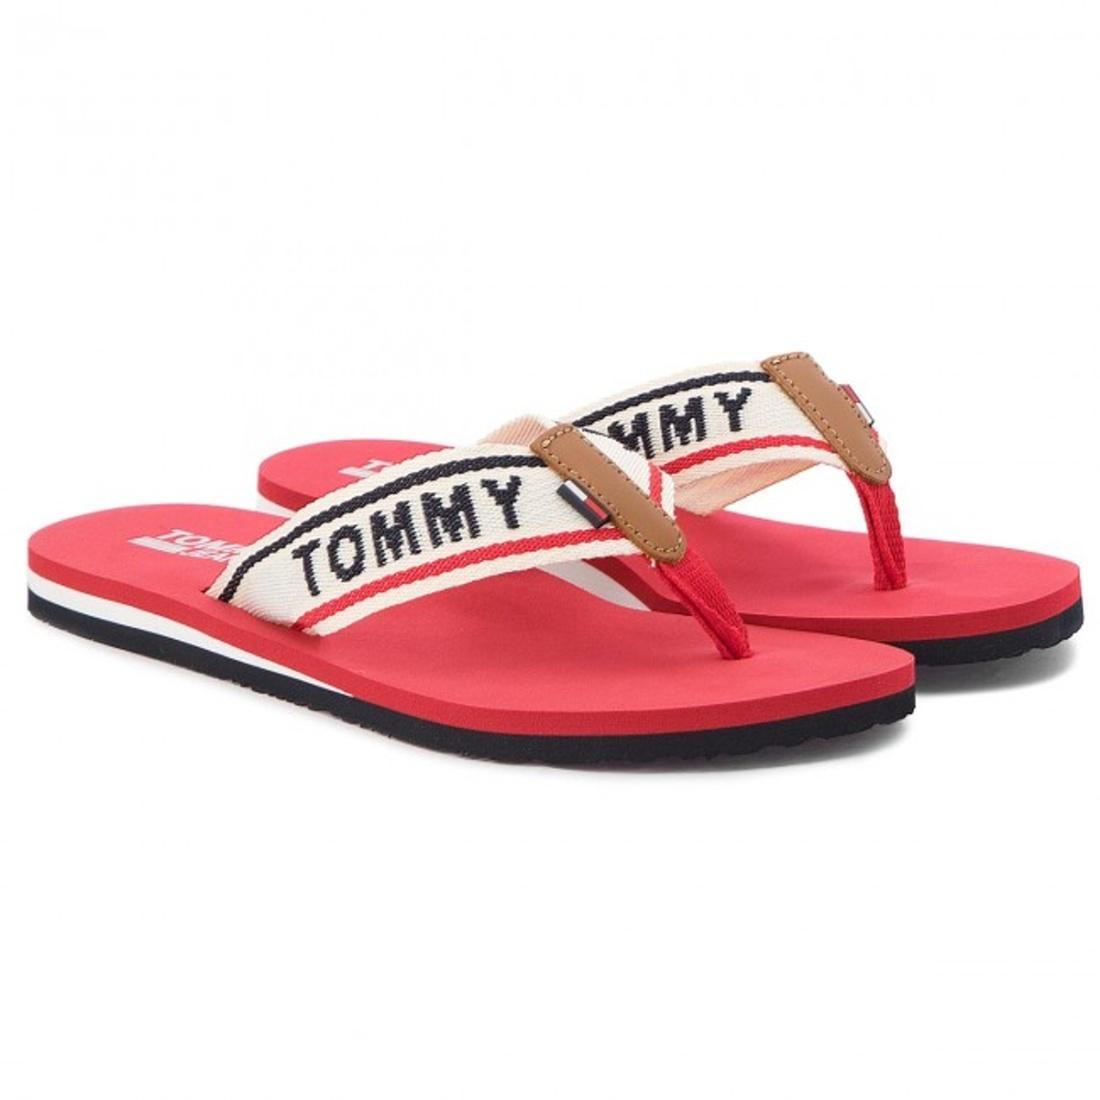 Tommy Hilfiger dámské červené žabky Beach - Mode.cz eac4742fa14